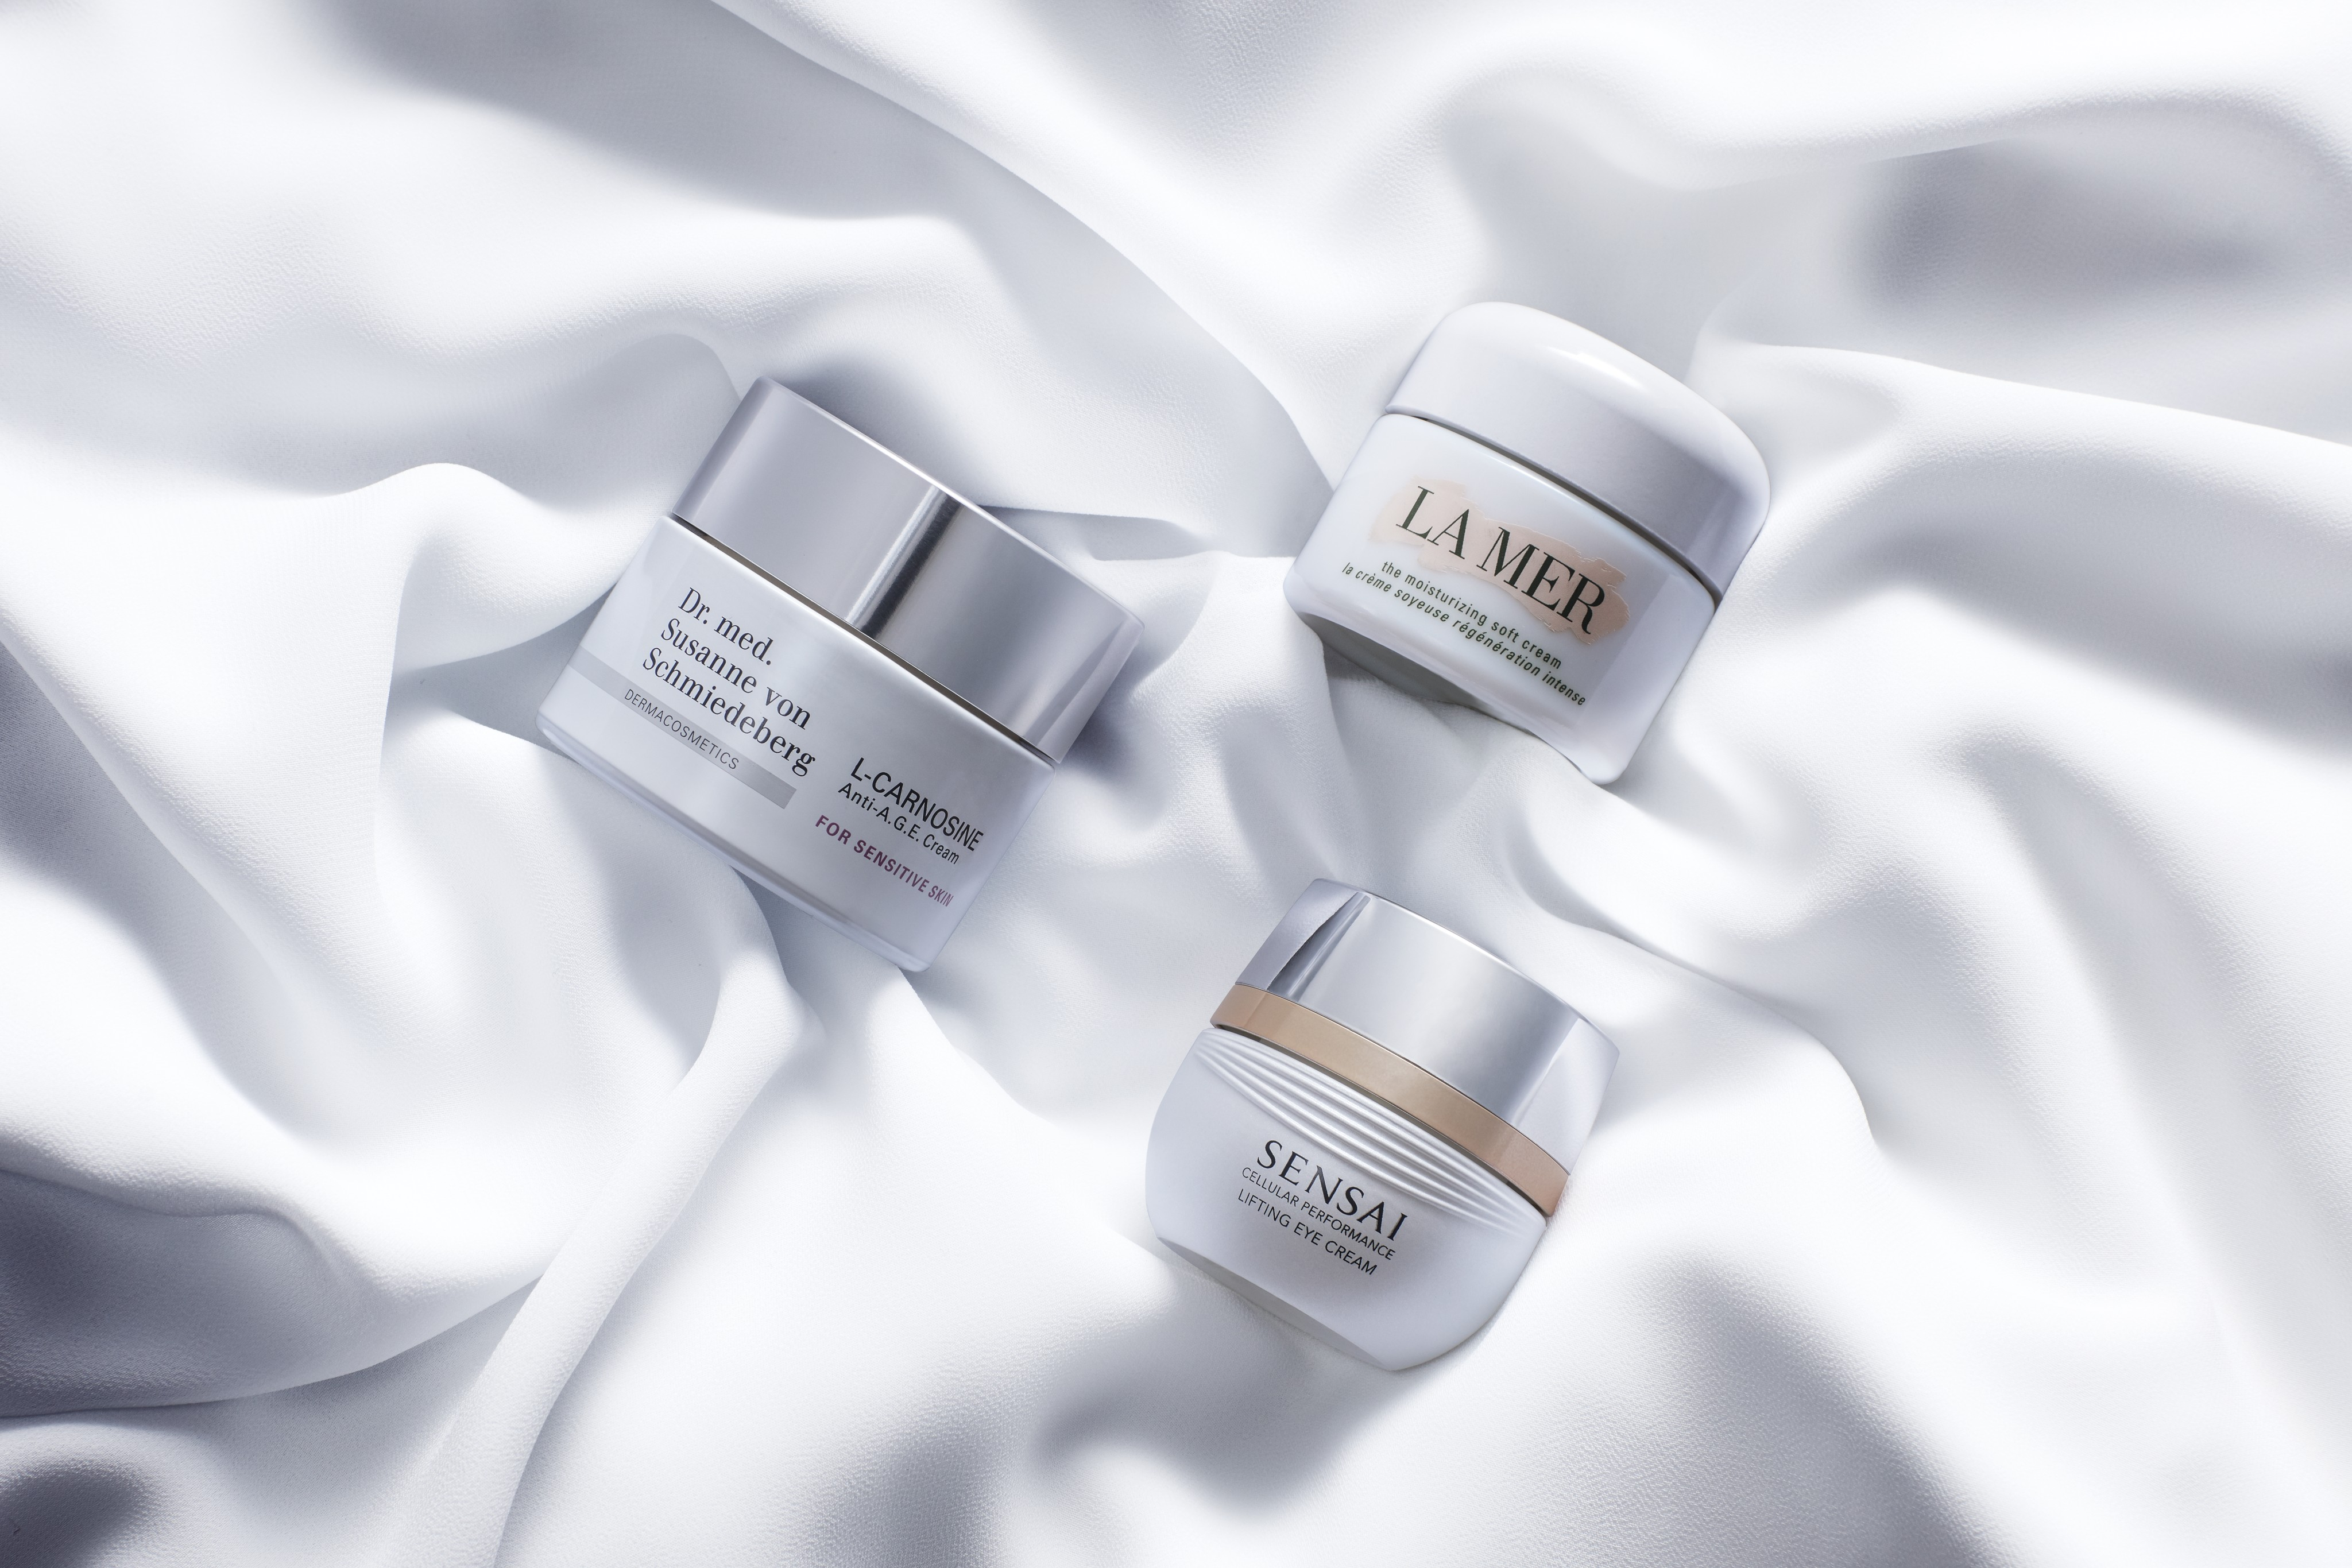 Skincare-product-sensitive-skin-moisturizer-white-silk-unlimited-Web-Rendition